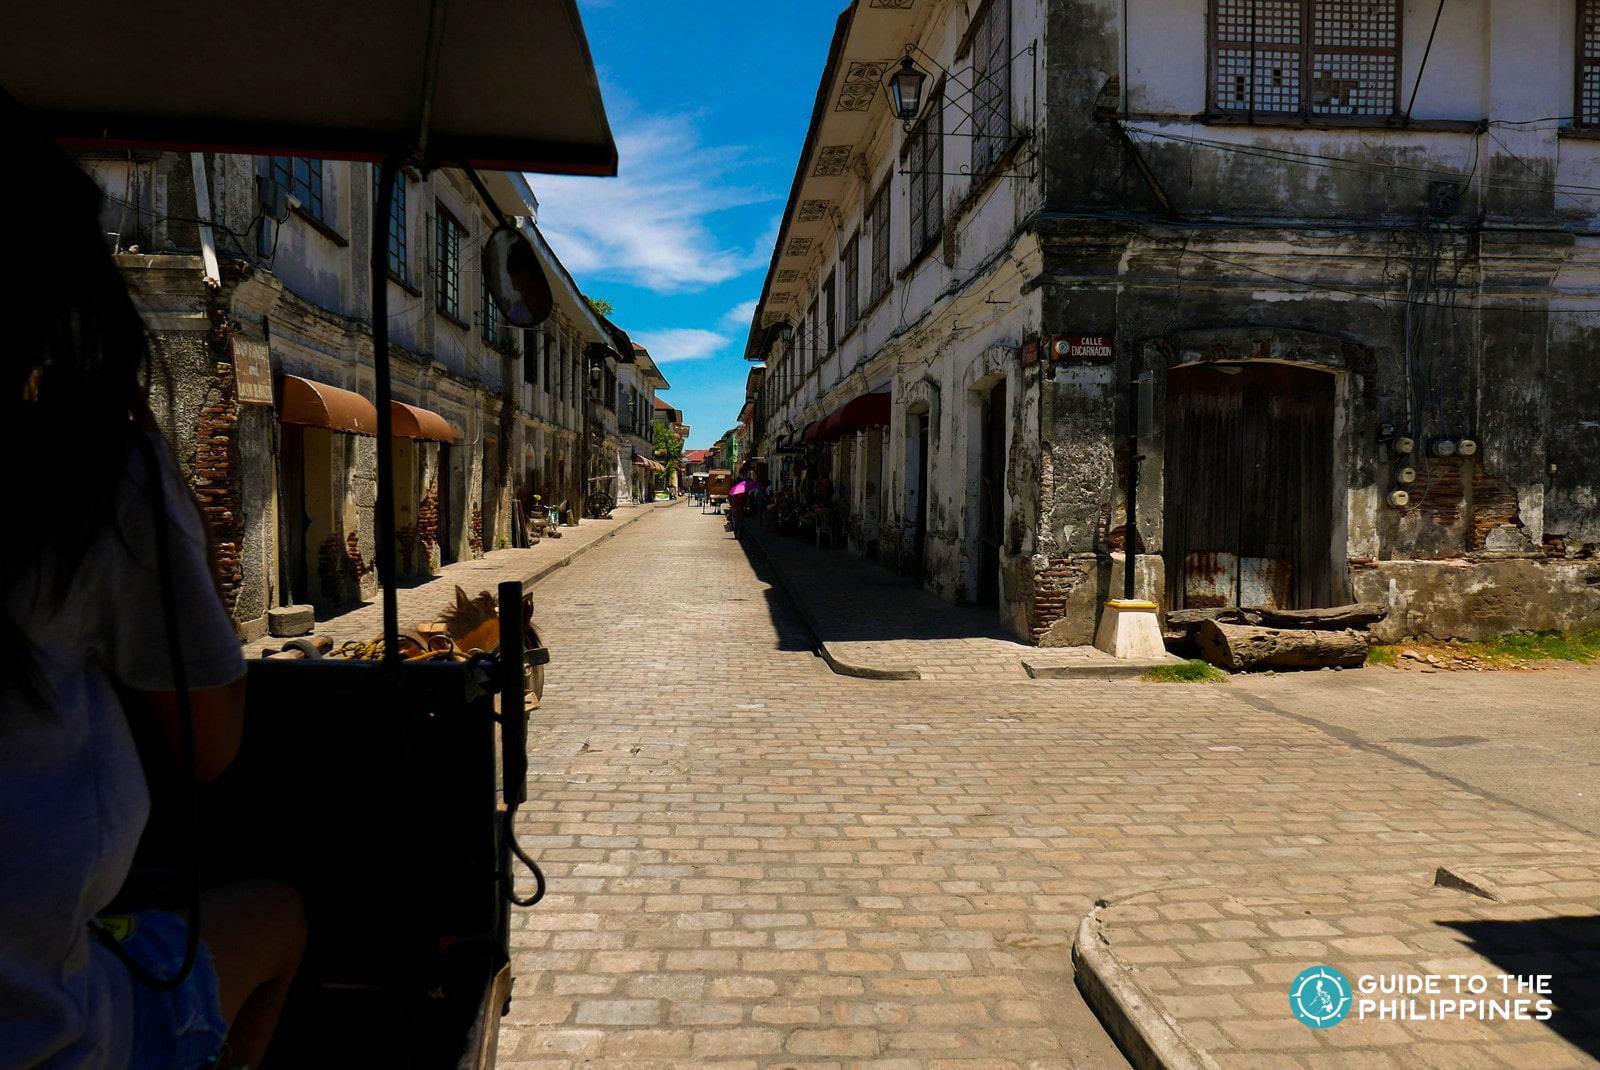 Riding a kalesa while exploring the streets of Calle Crisologo